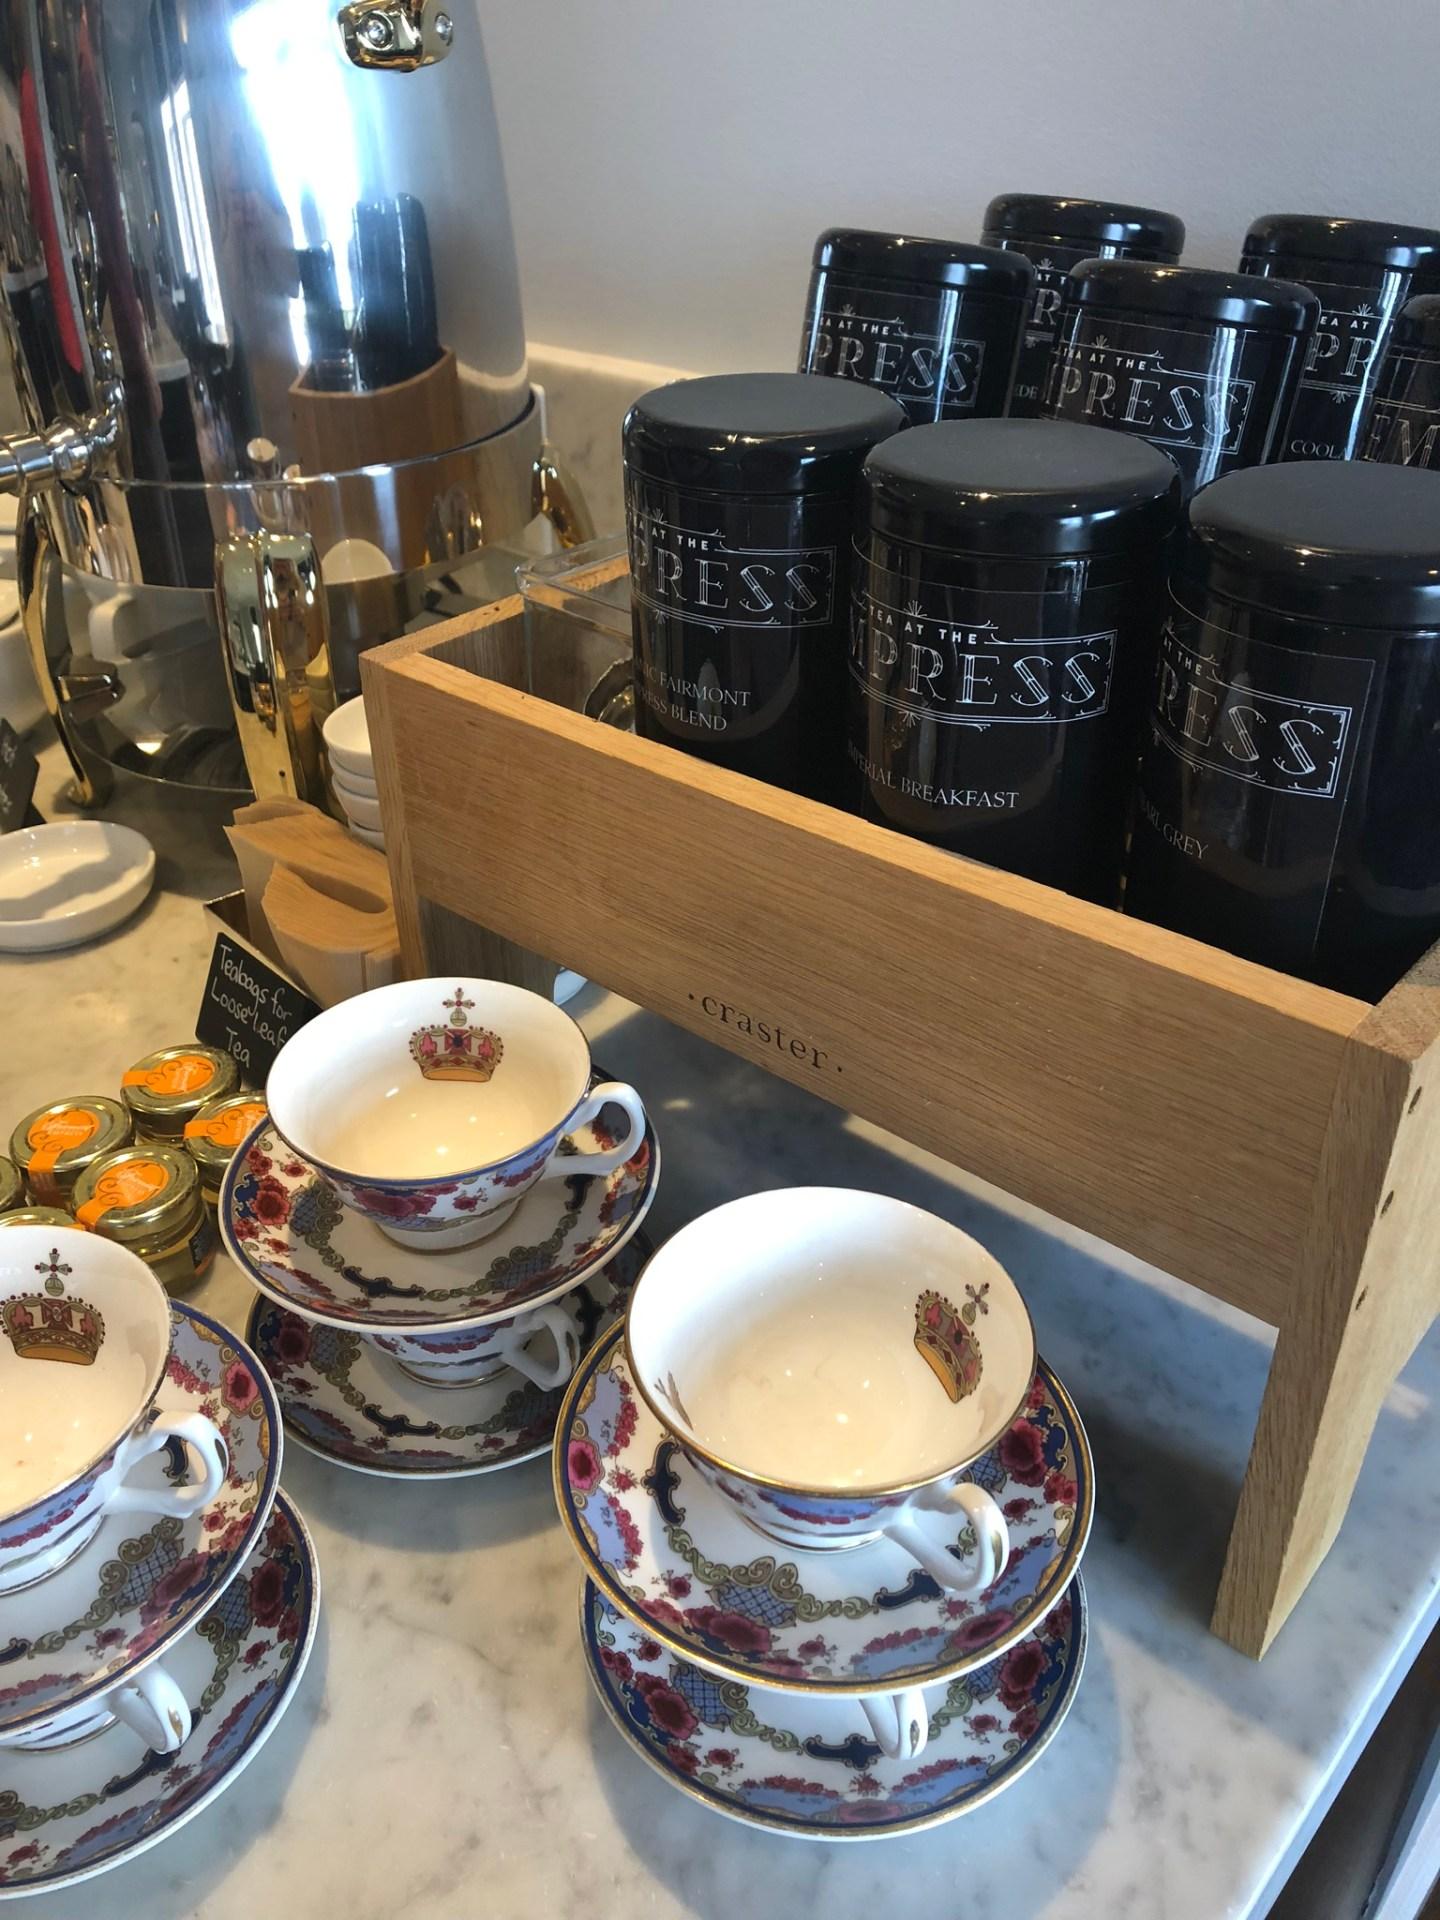 Tea selection at the Fairmont Empress